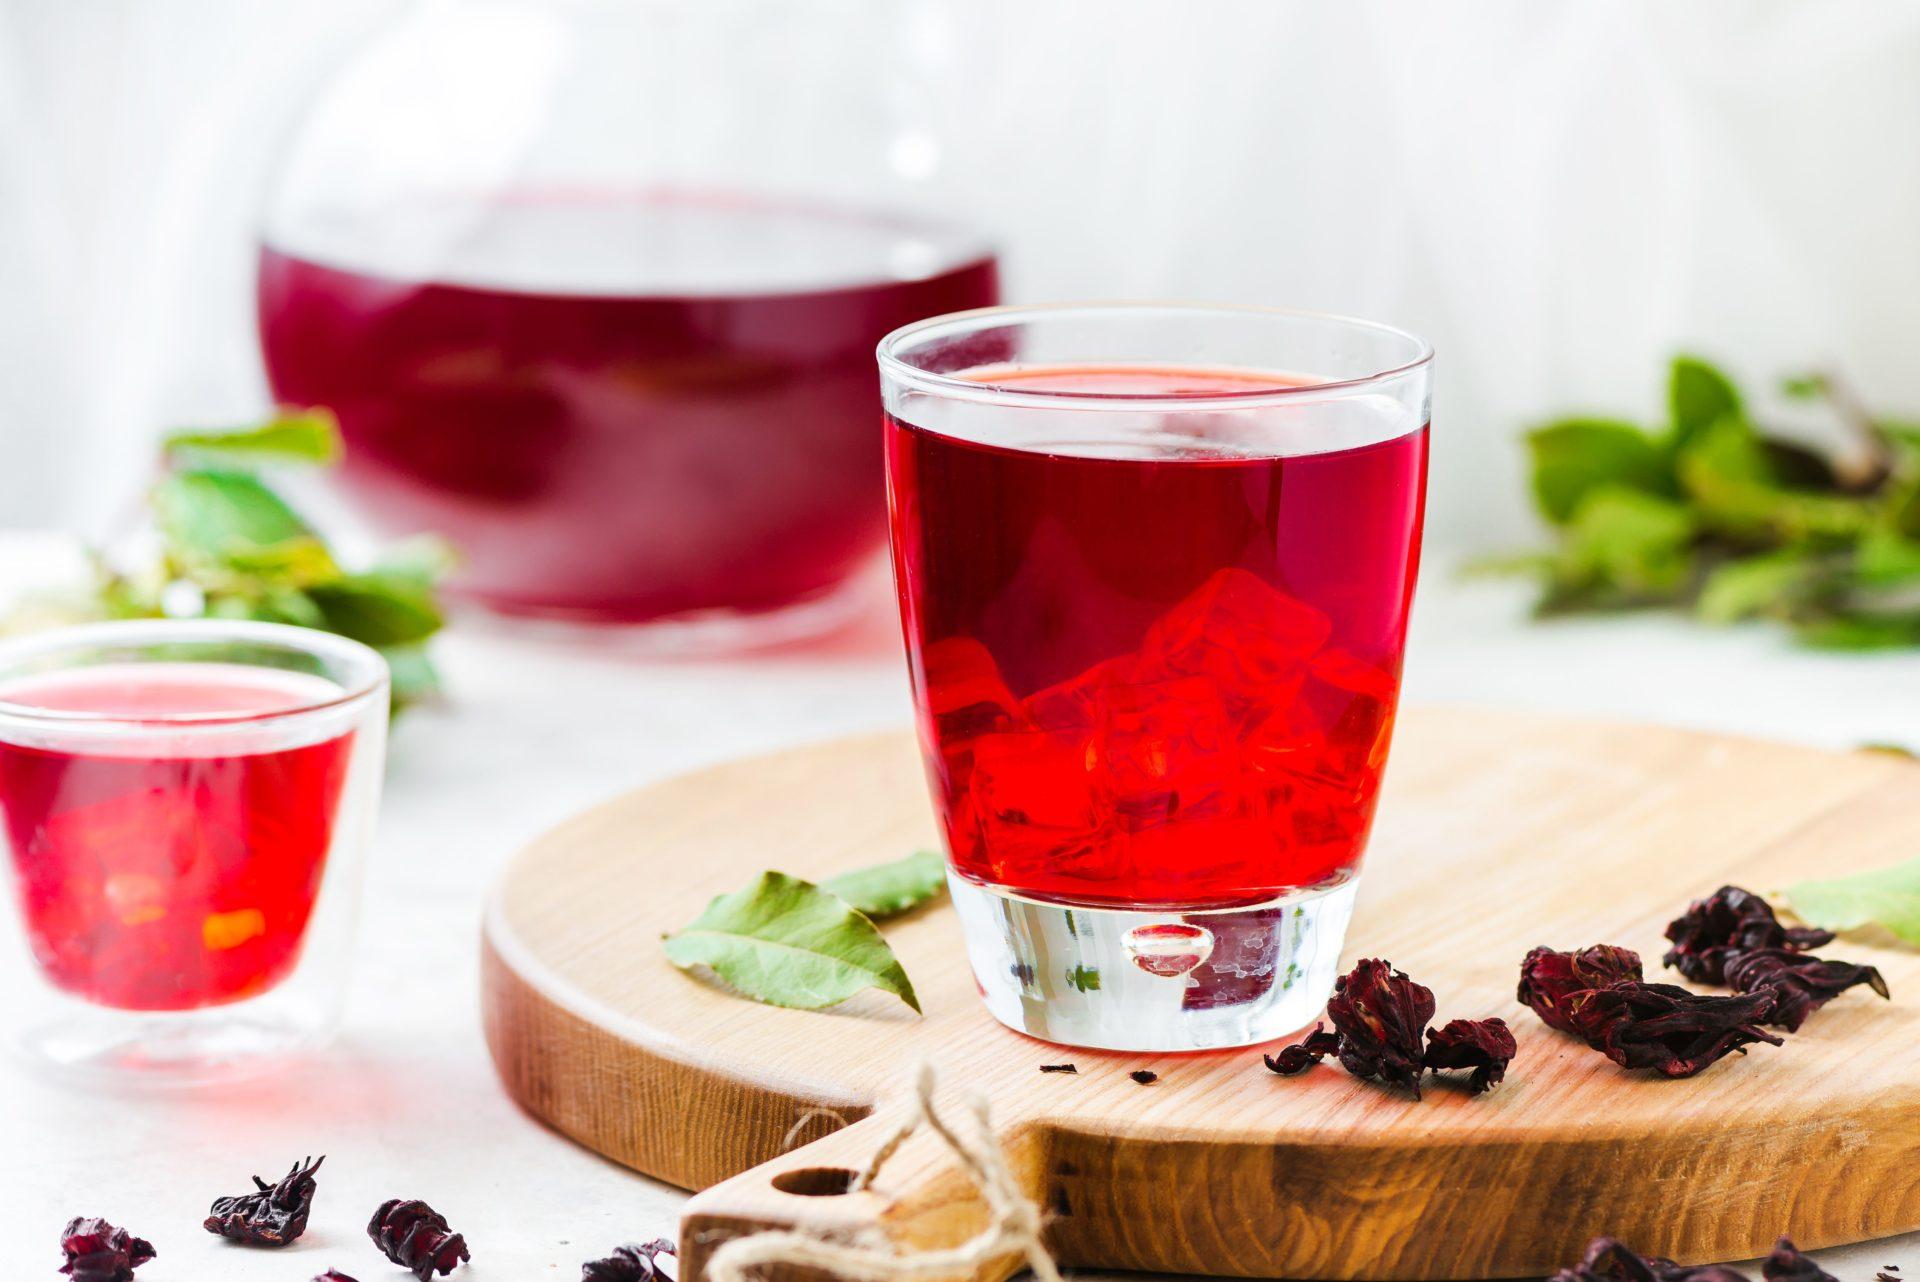 Die wunderbare Wirkung von Hibiskus-Tee